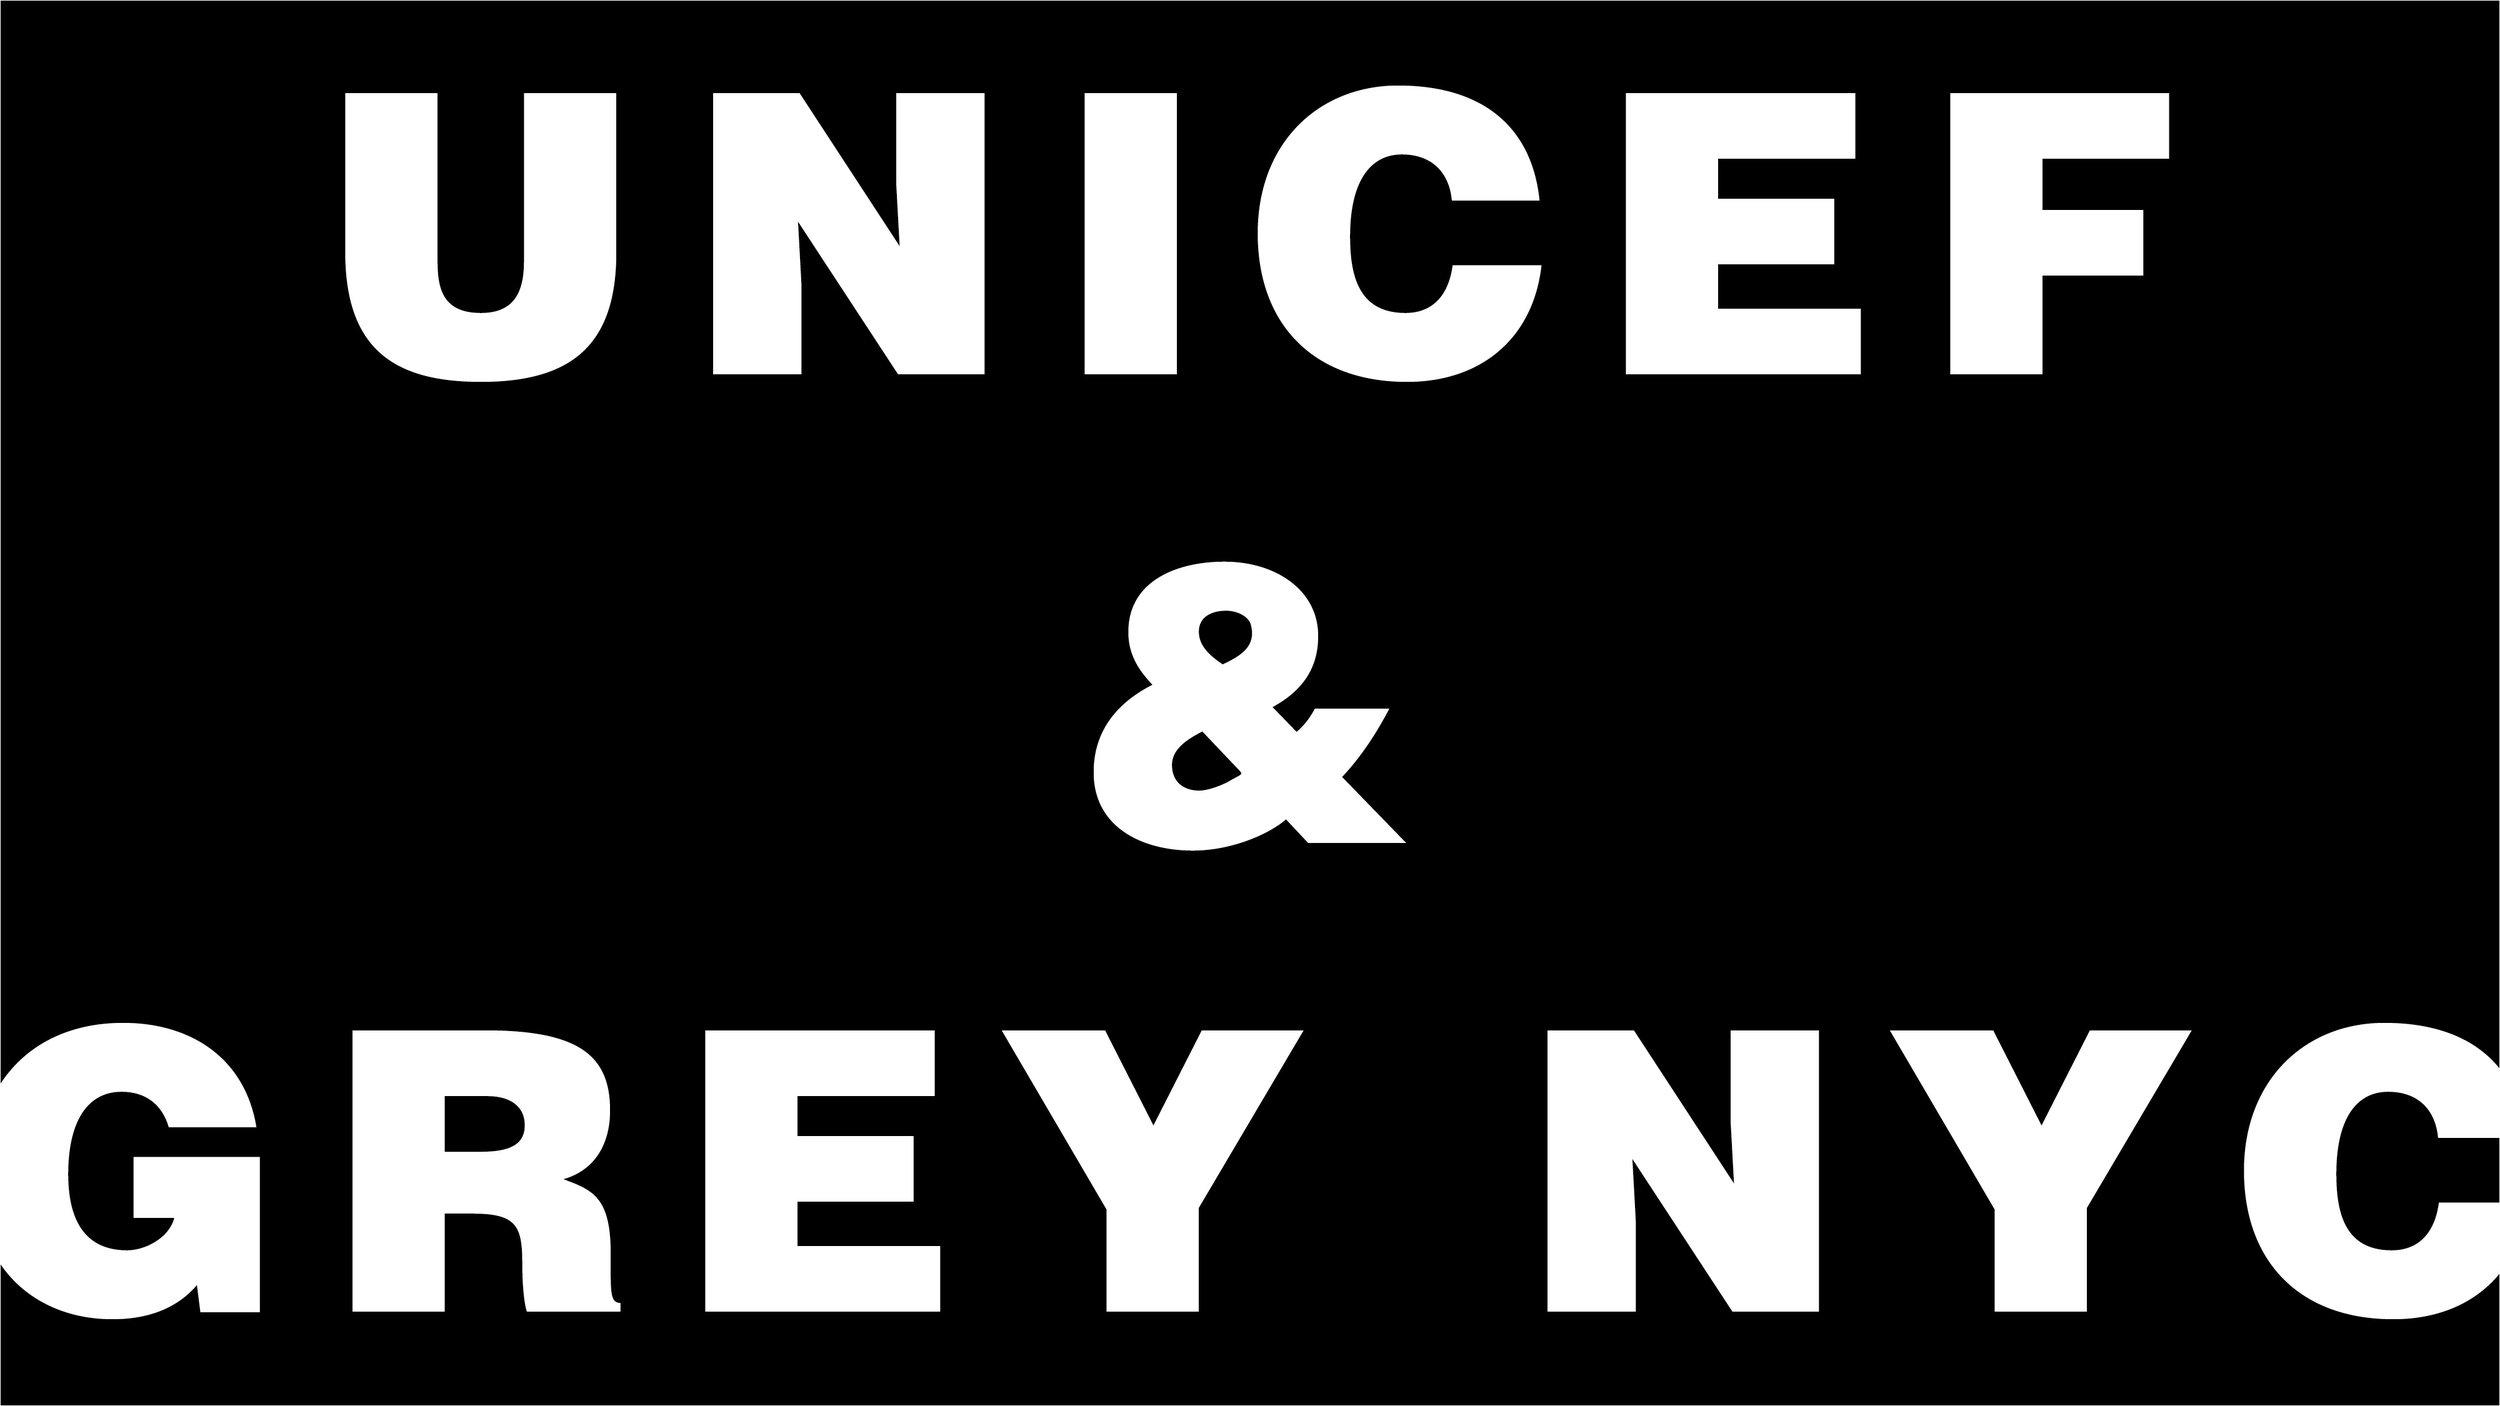 UNICEF_teeShirt_new.jpg